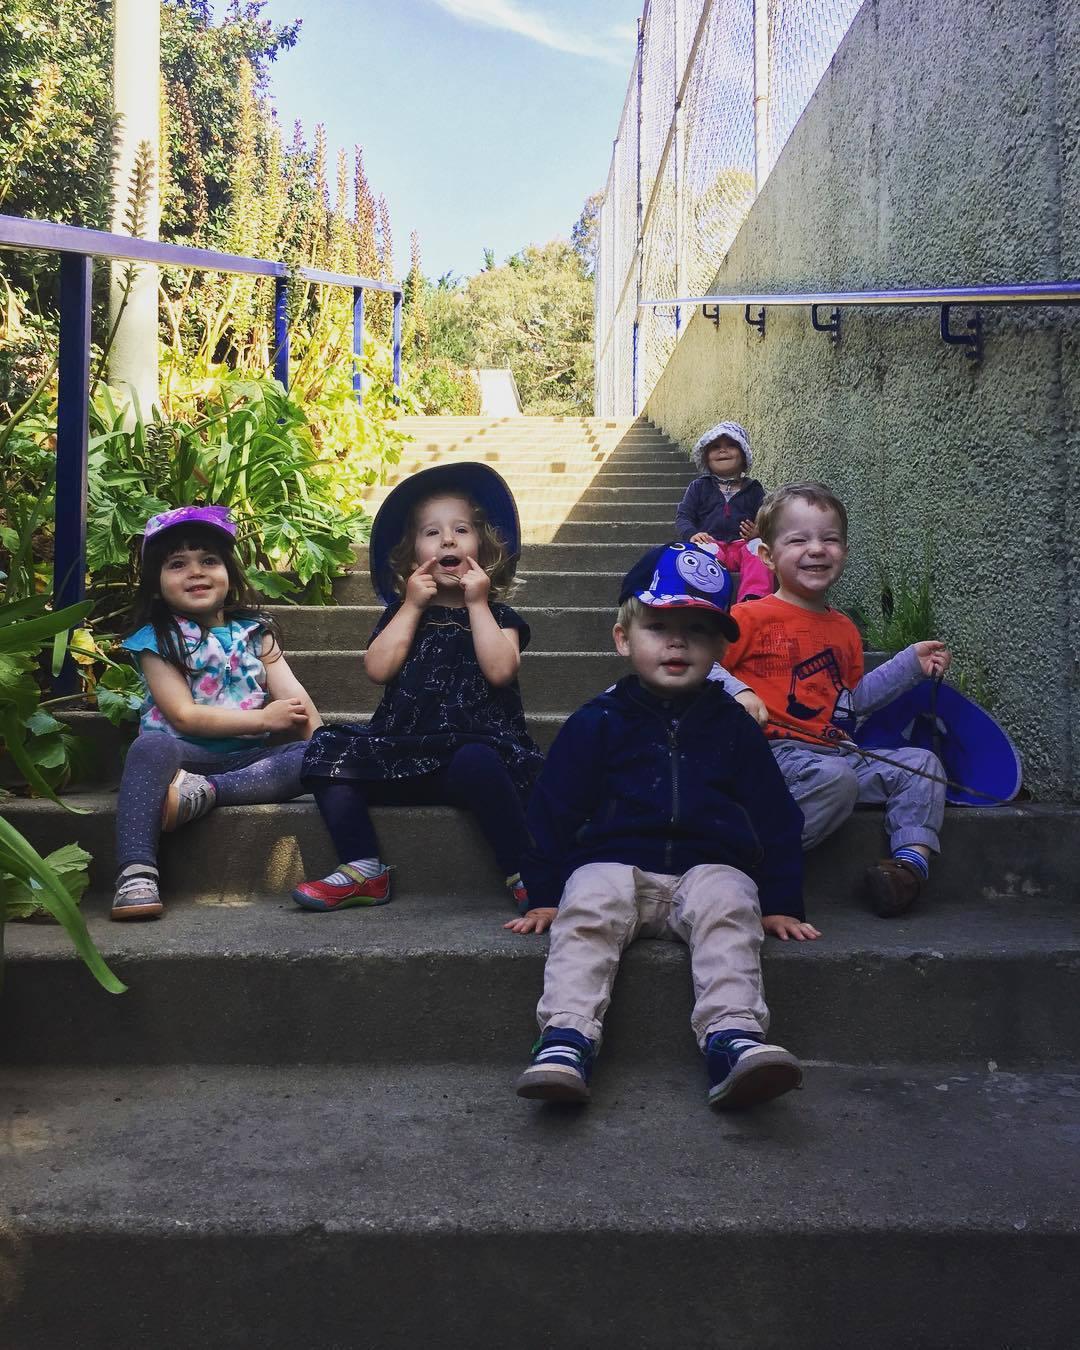 playschool_stairs_group